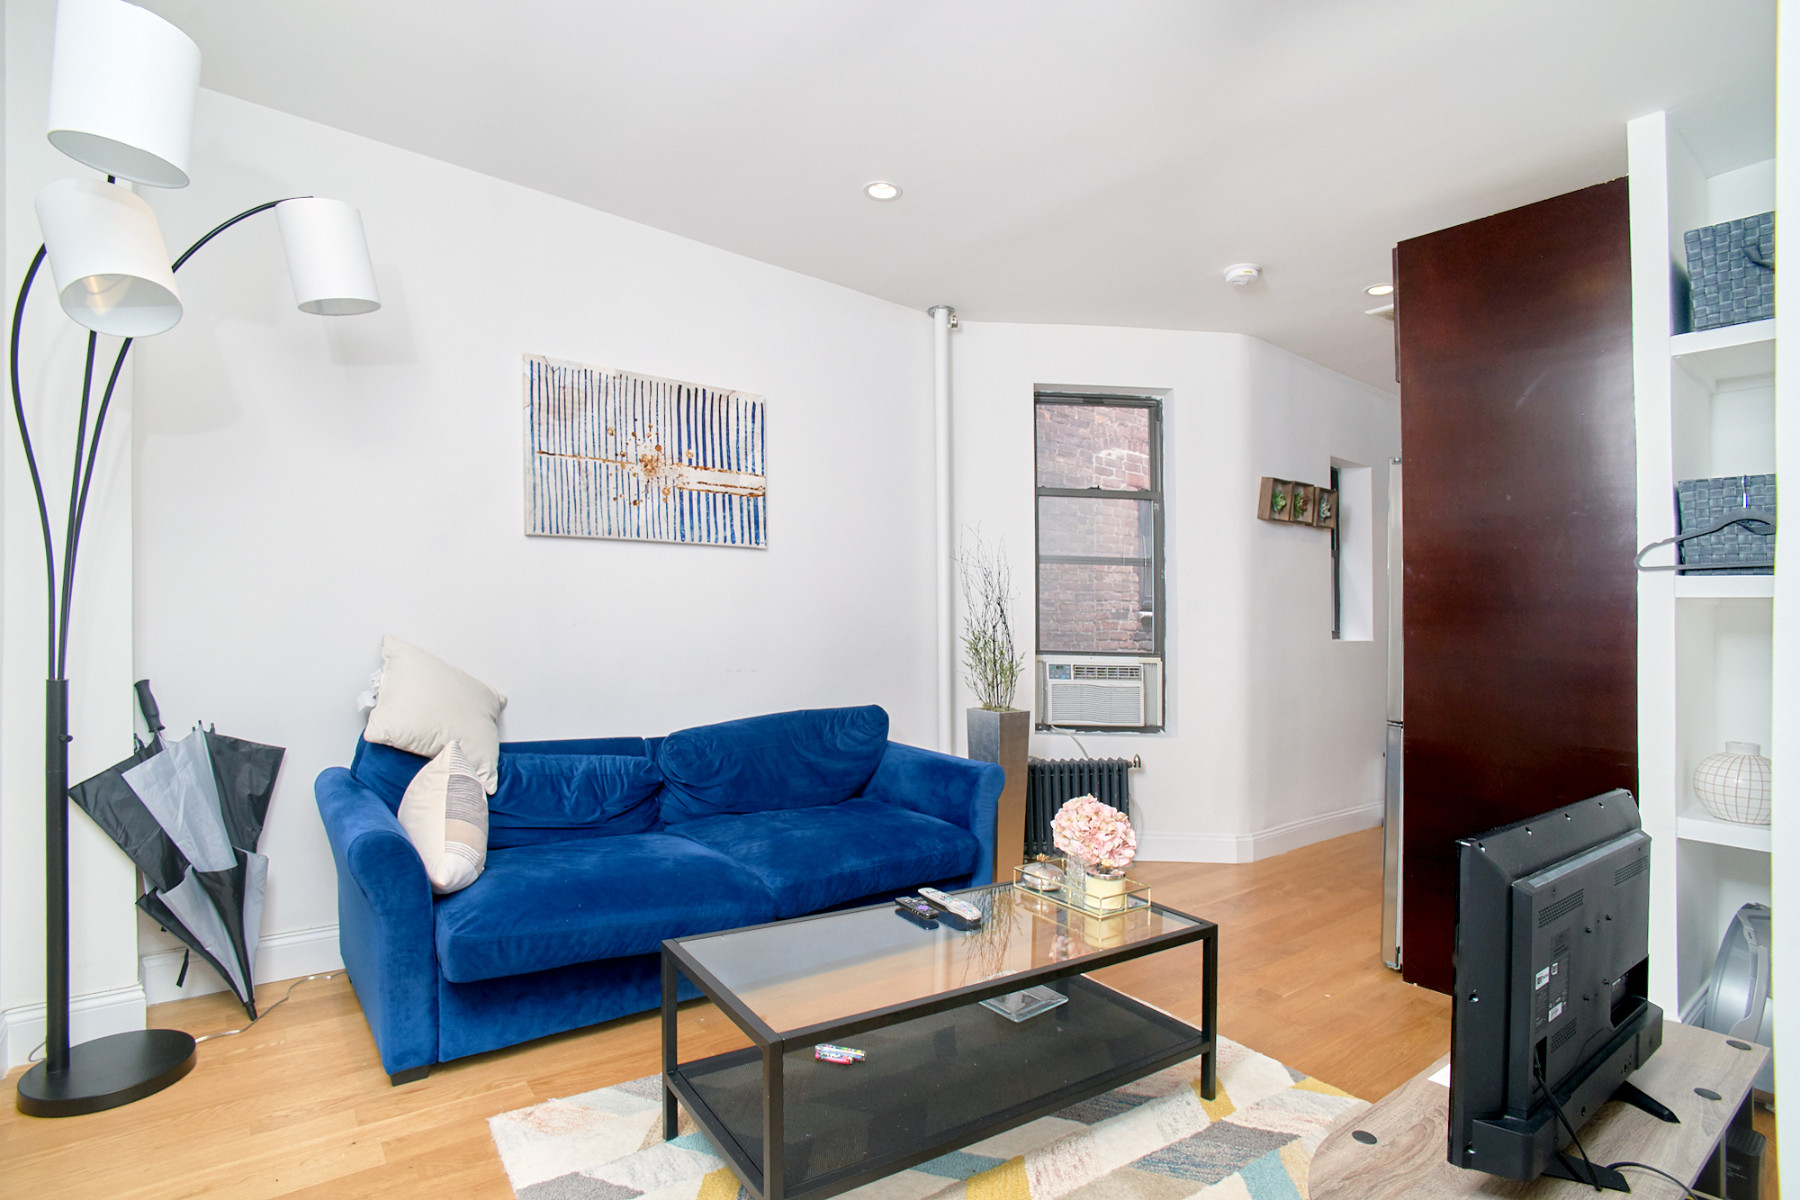 325 East 83rd Street, Apt 5A, Manhattan, New York 10028